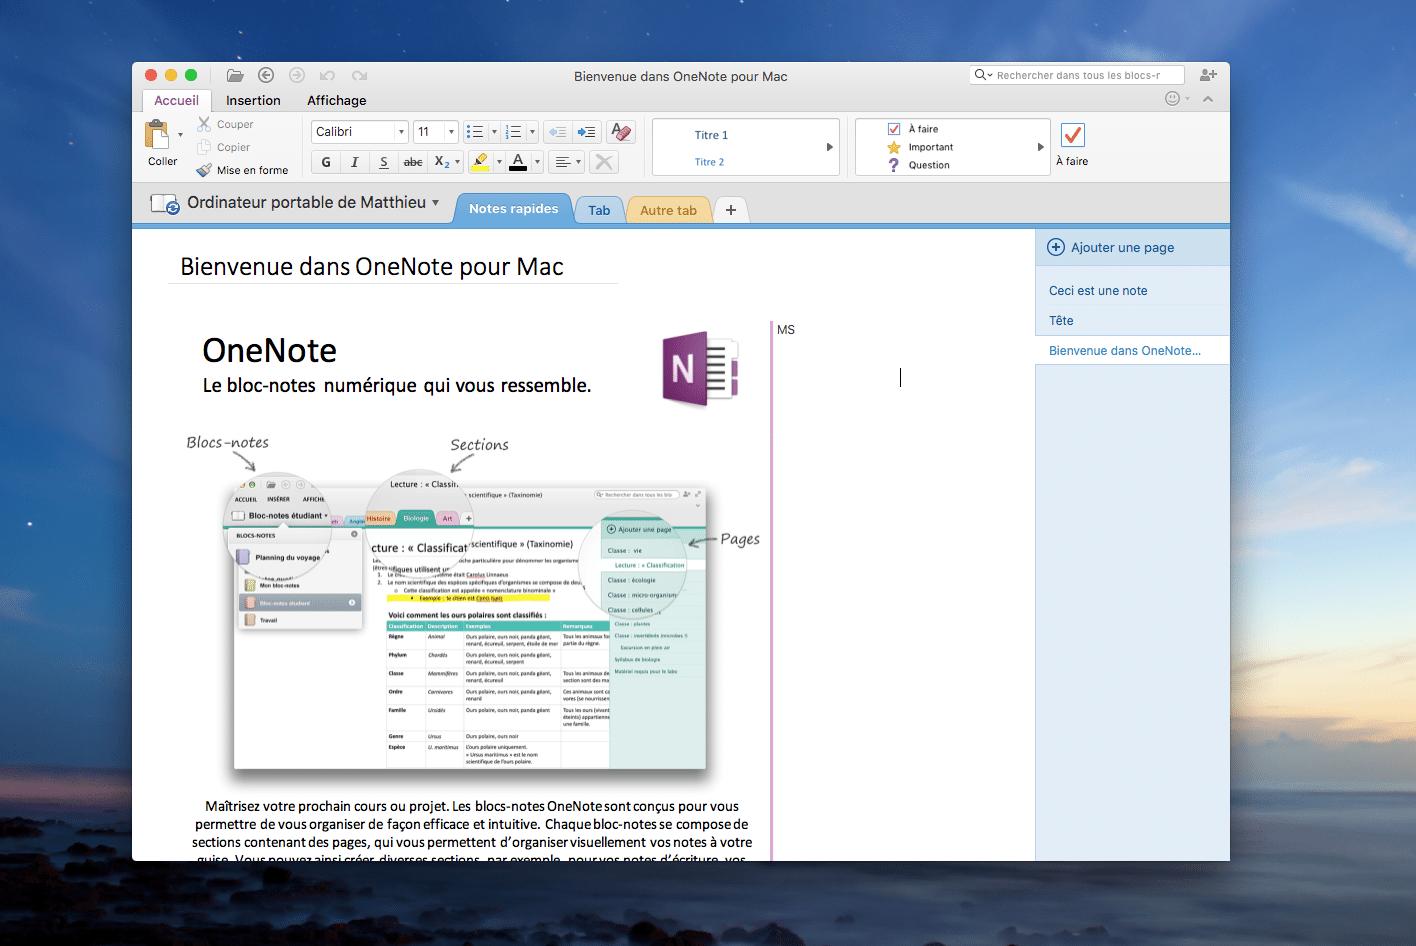 onenote-microsoft